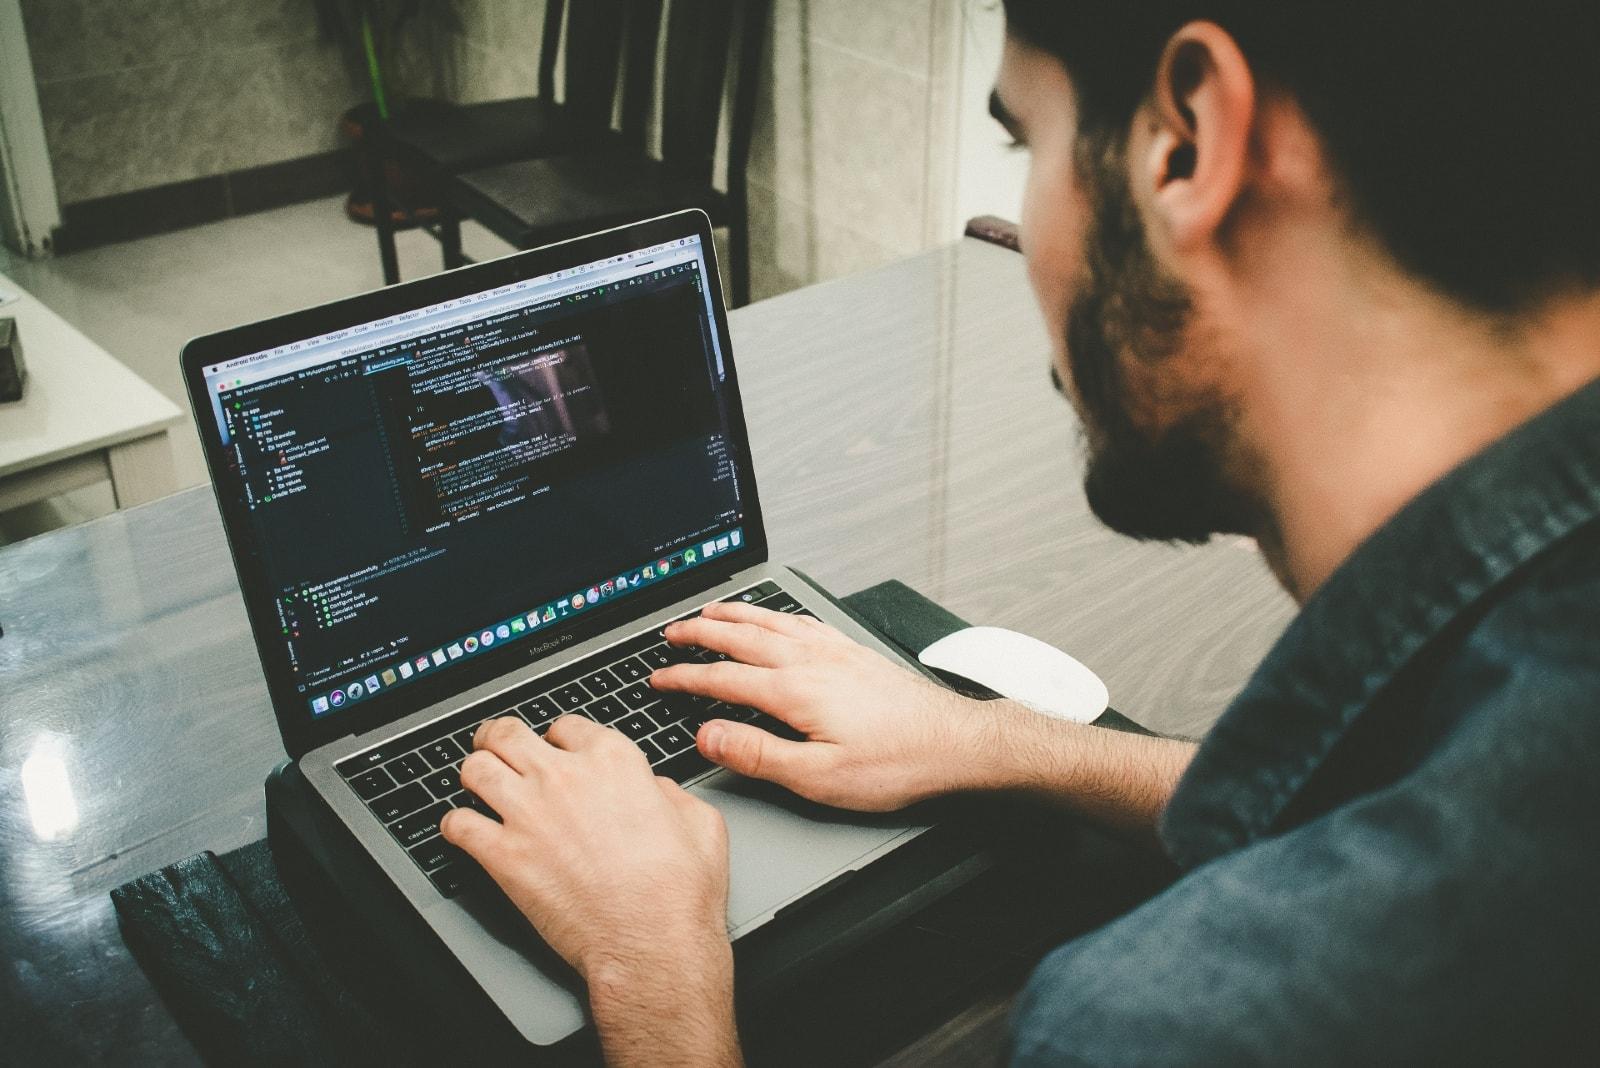 man using laptop while sitting at table